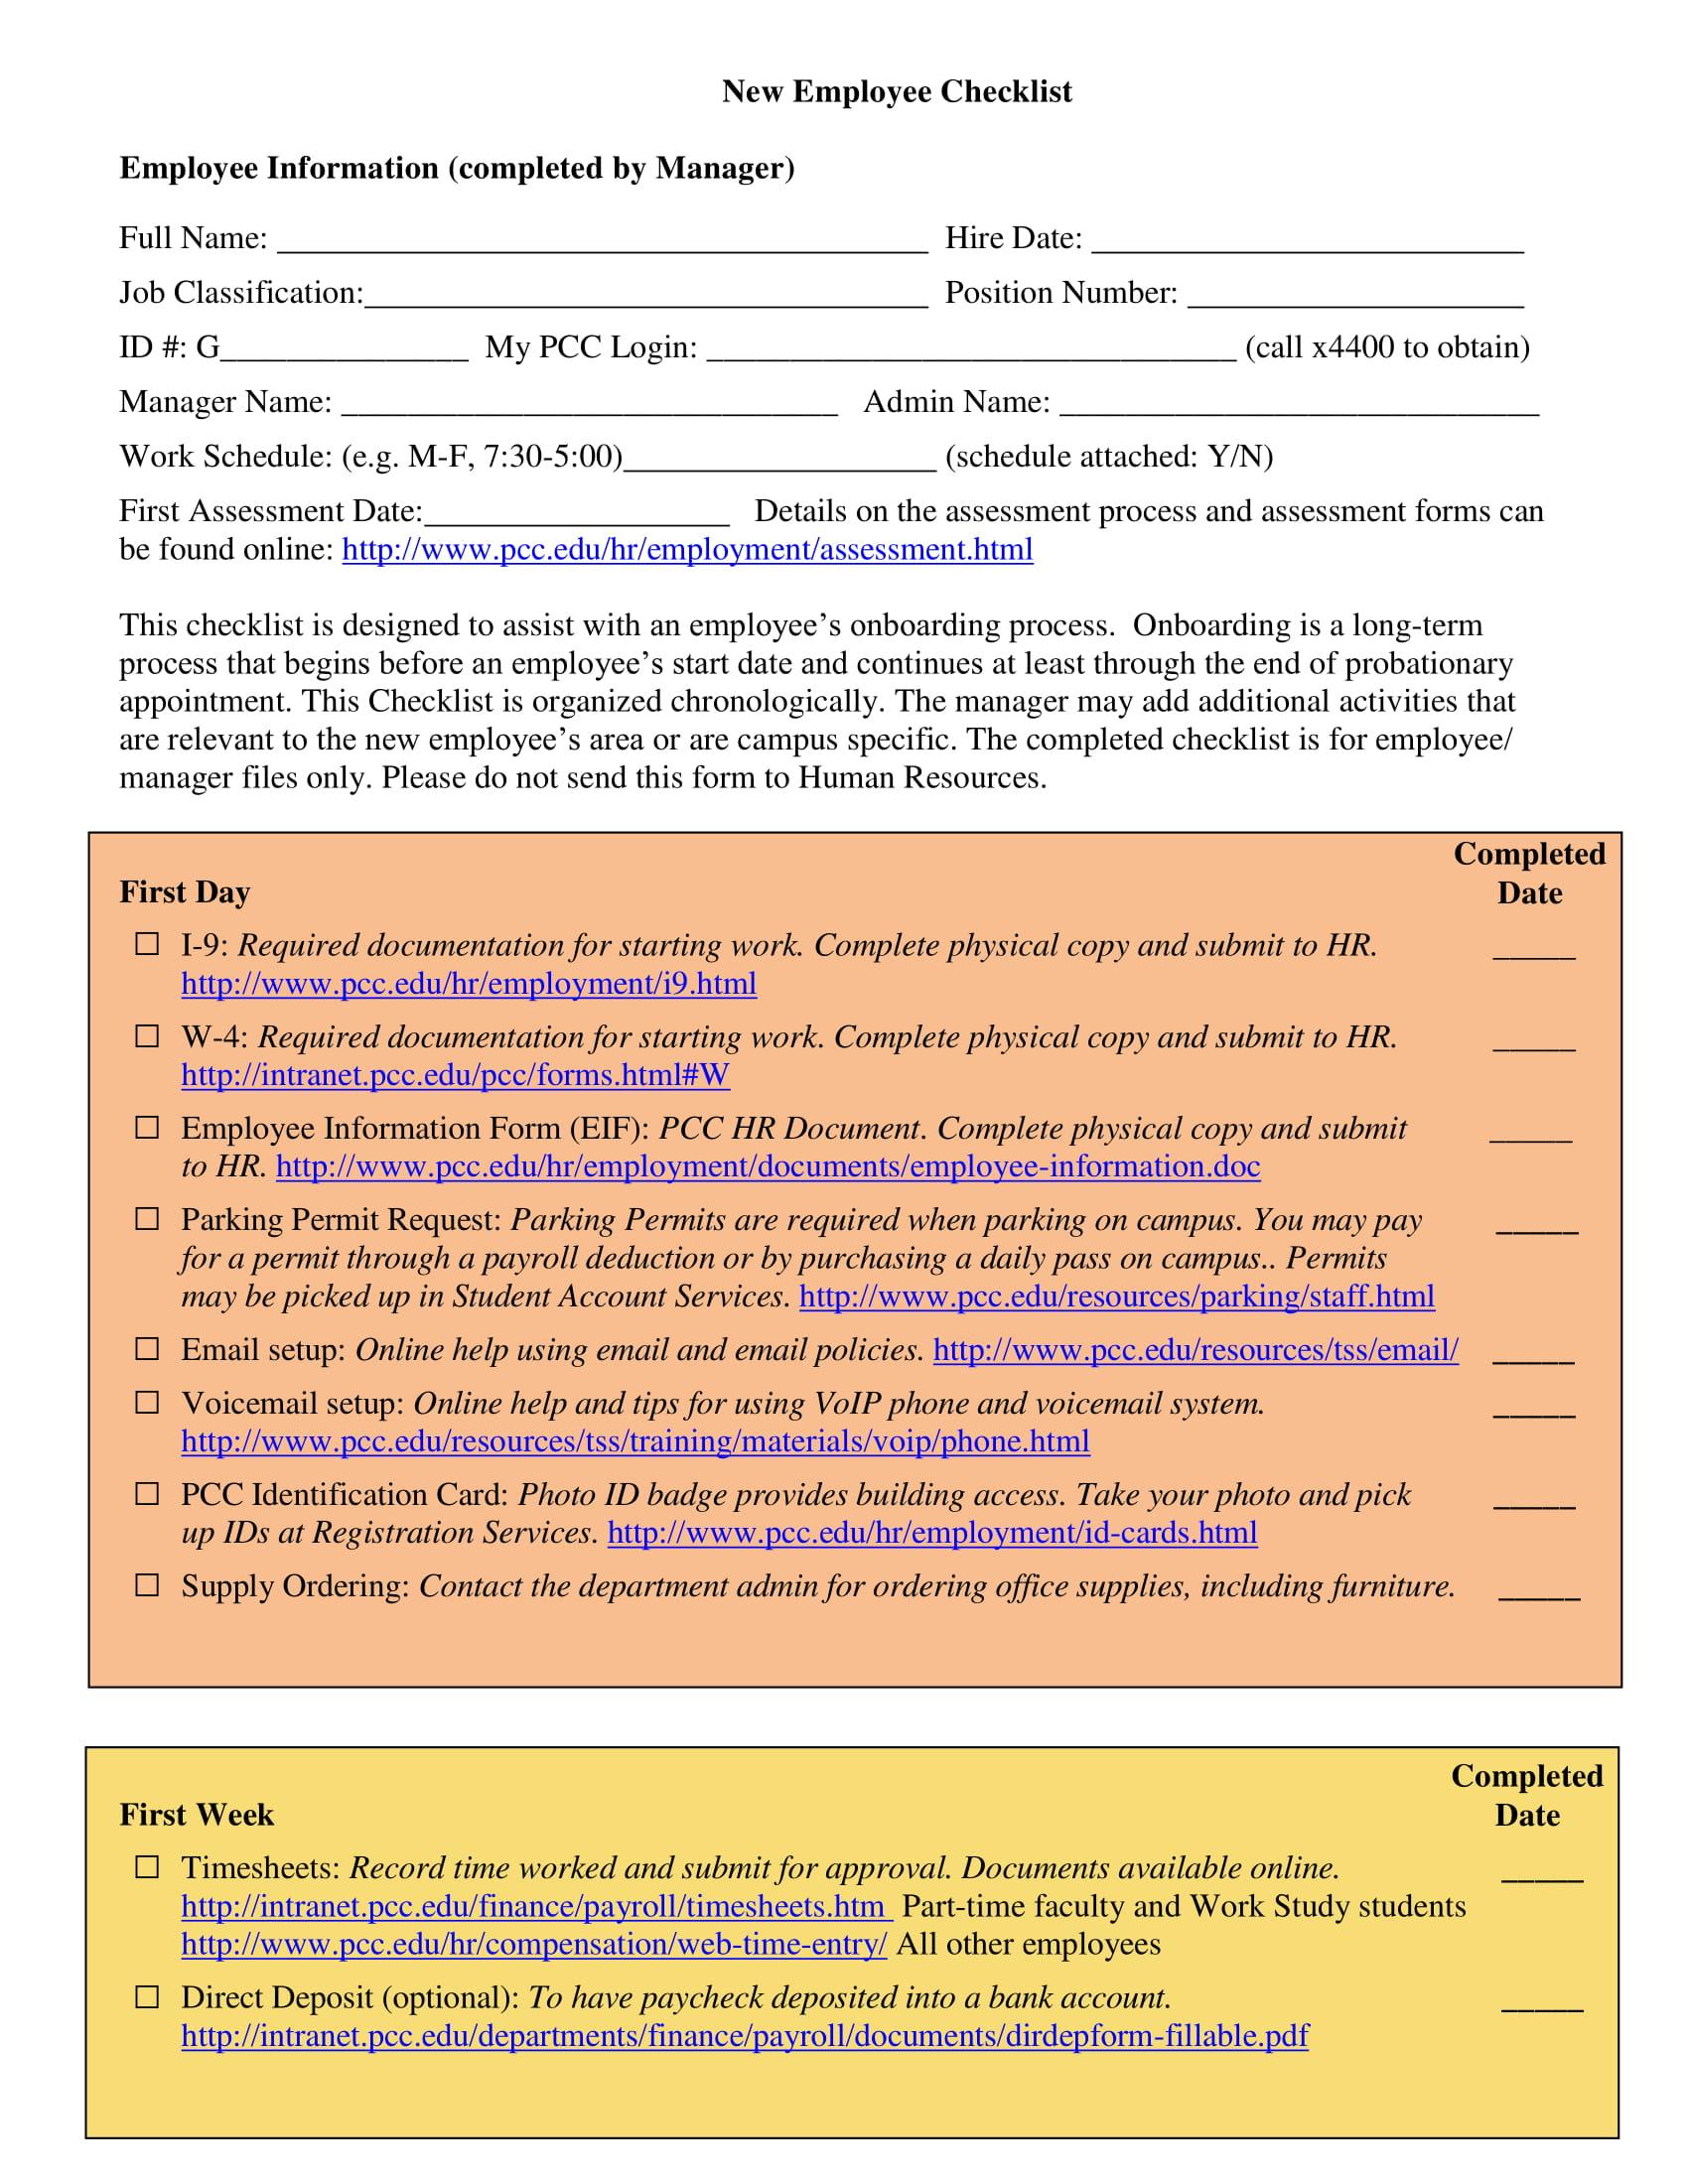 new checklist 1